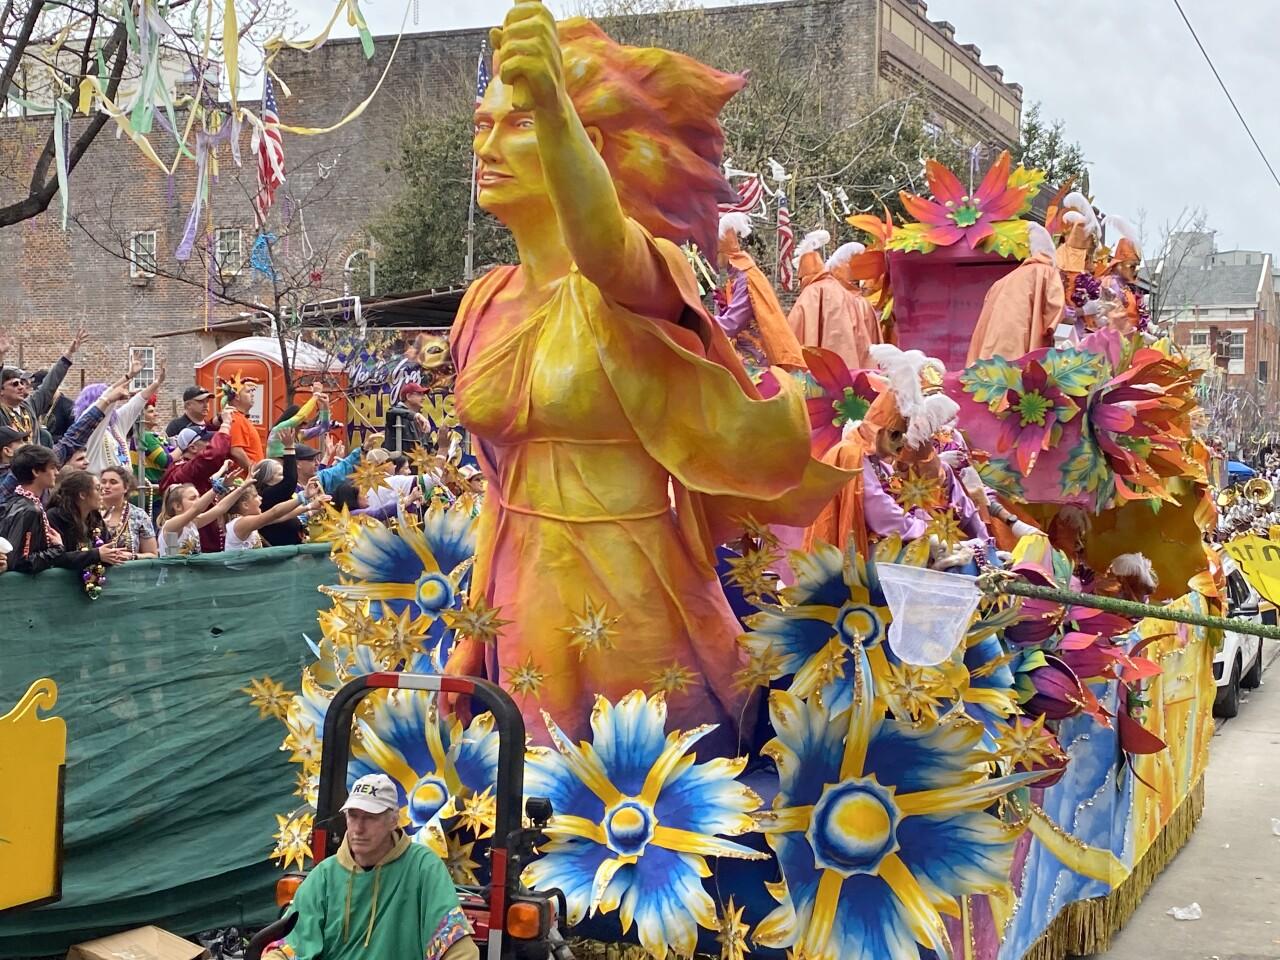 Zulu parade New Orleans (Scott Brazda)